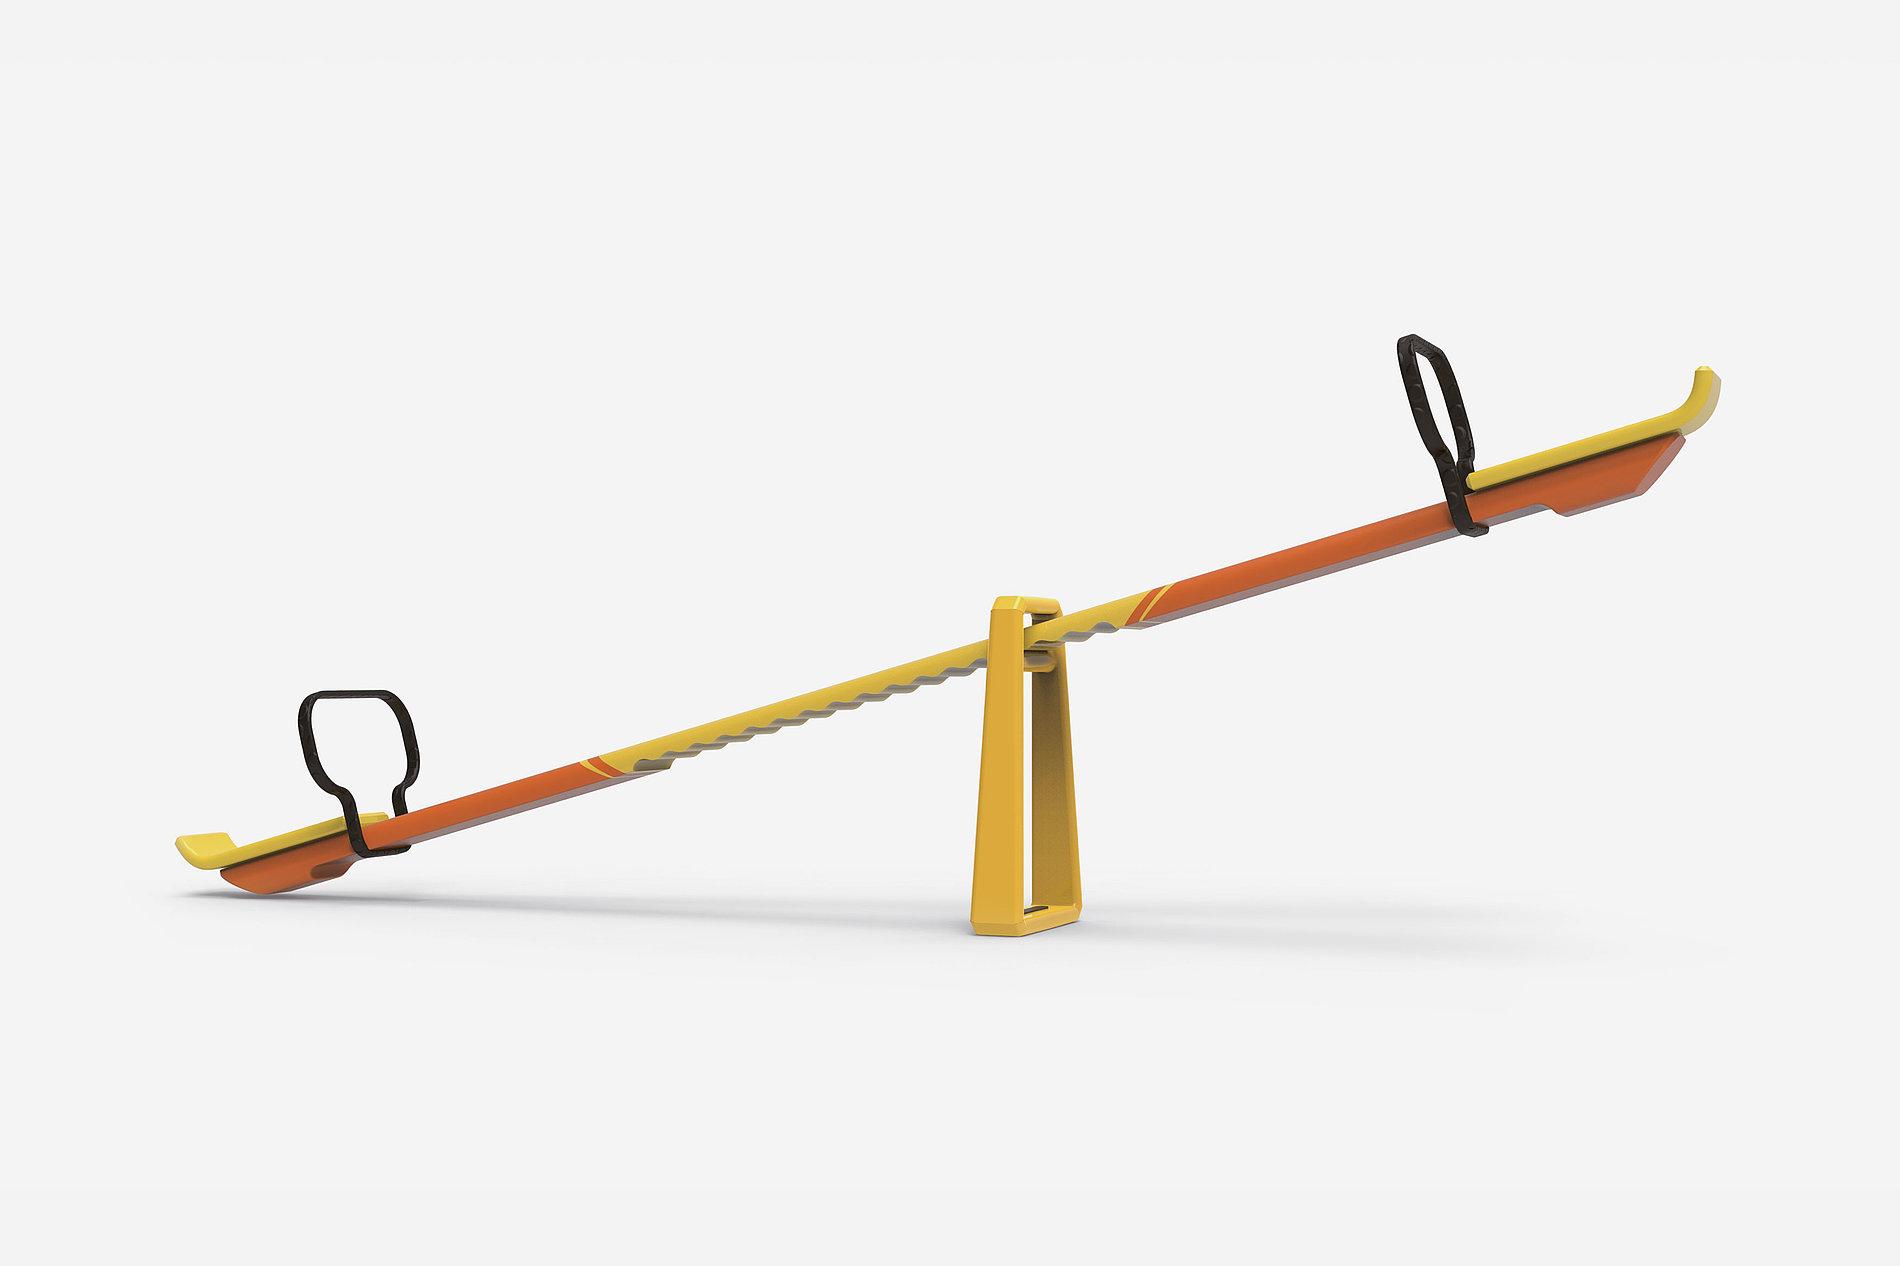 Parenting Adjustable Pivot Seesaw | Red Dot Design Award